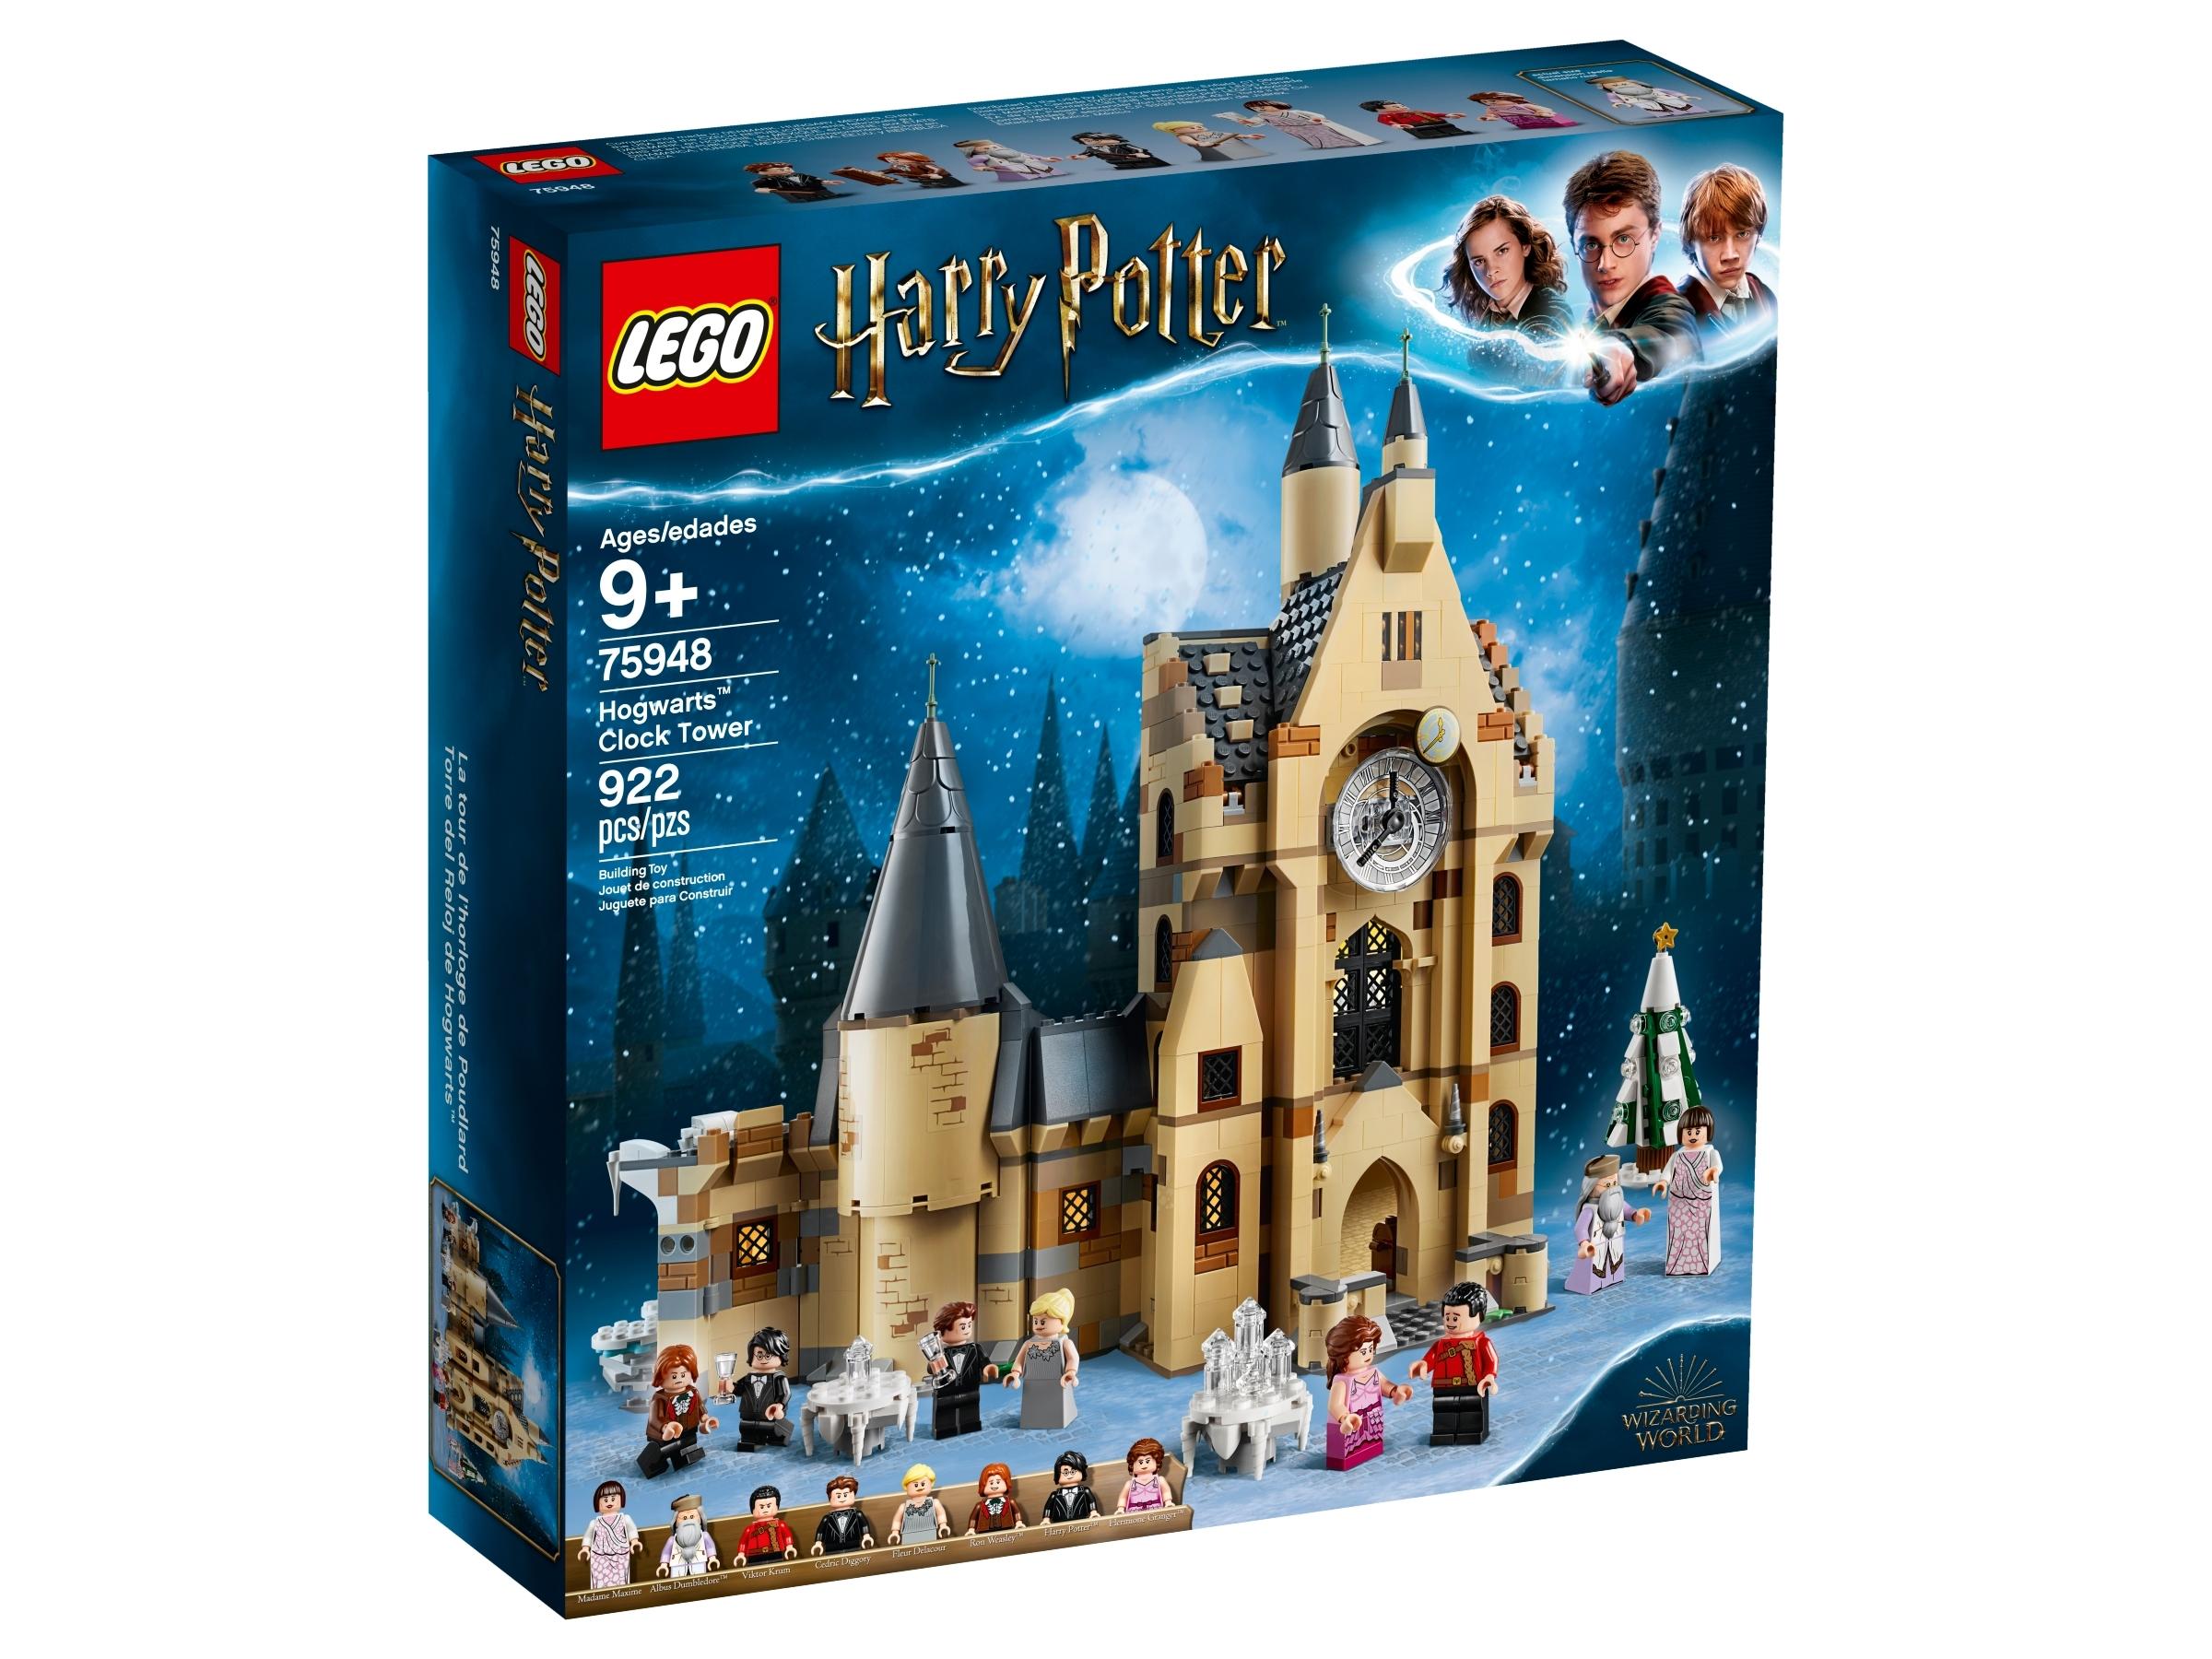 Set of 4 Brick Arches 1 x 8 x 2 BLACK  Star Wars  Harry Potter LEGO LEGOS